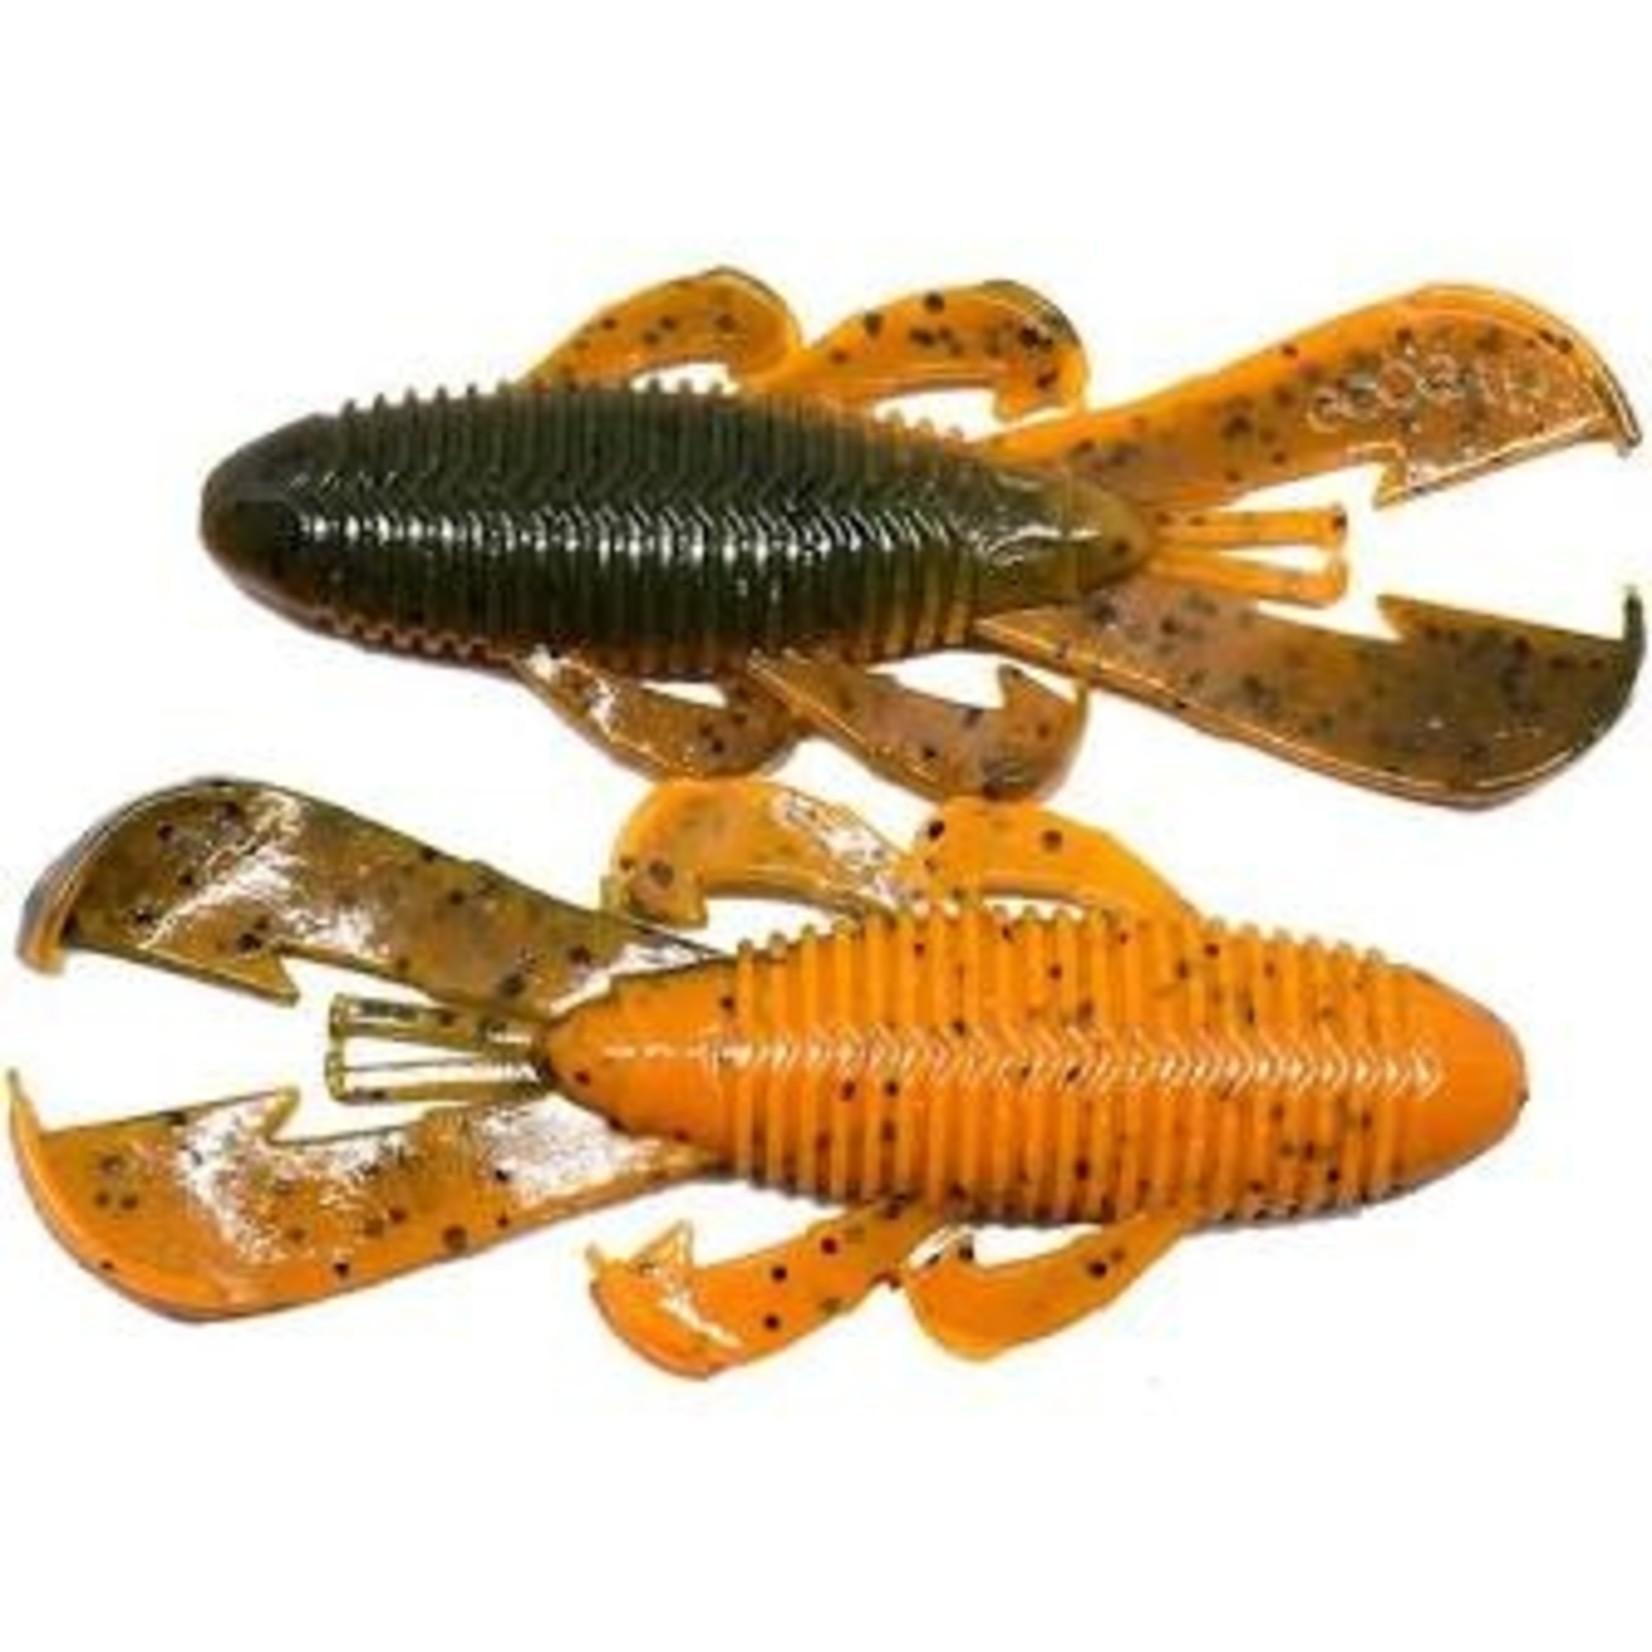 bandito bug alabama craw